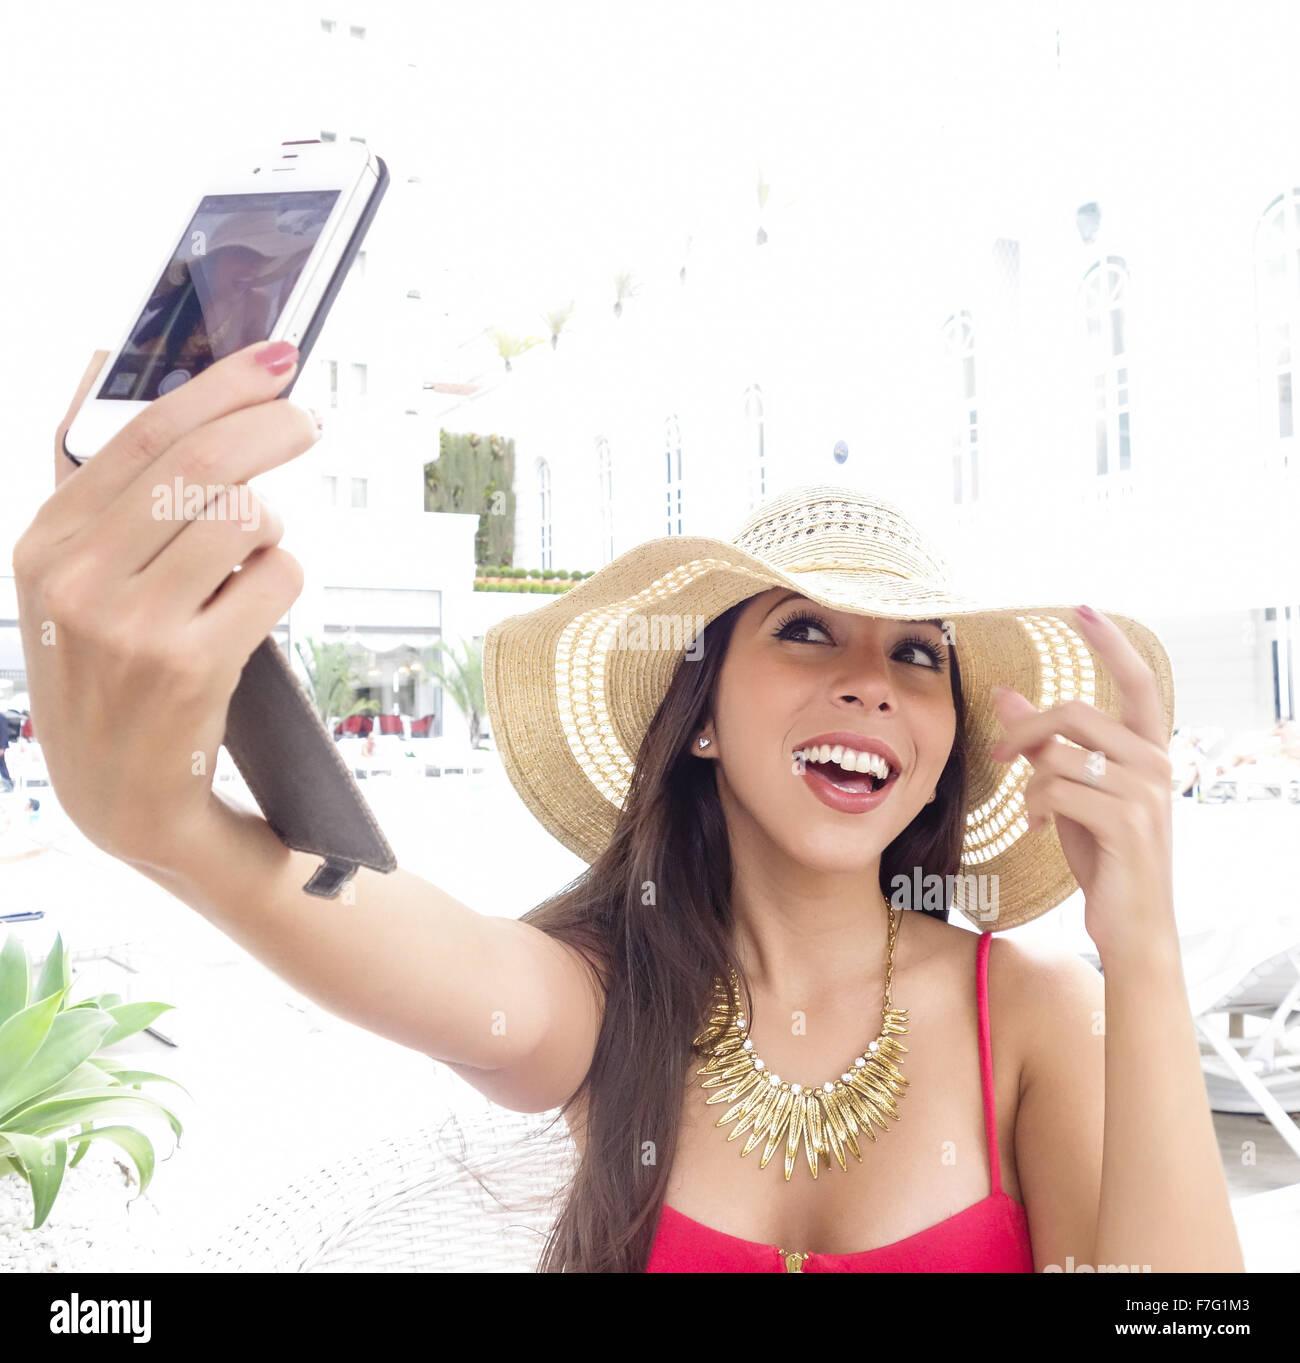 mexikanische Mädchen Selfies